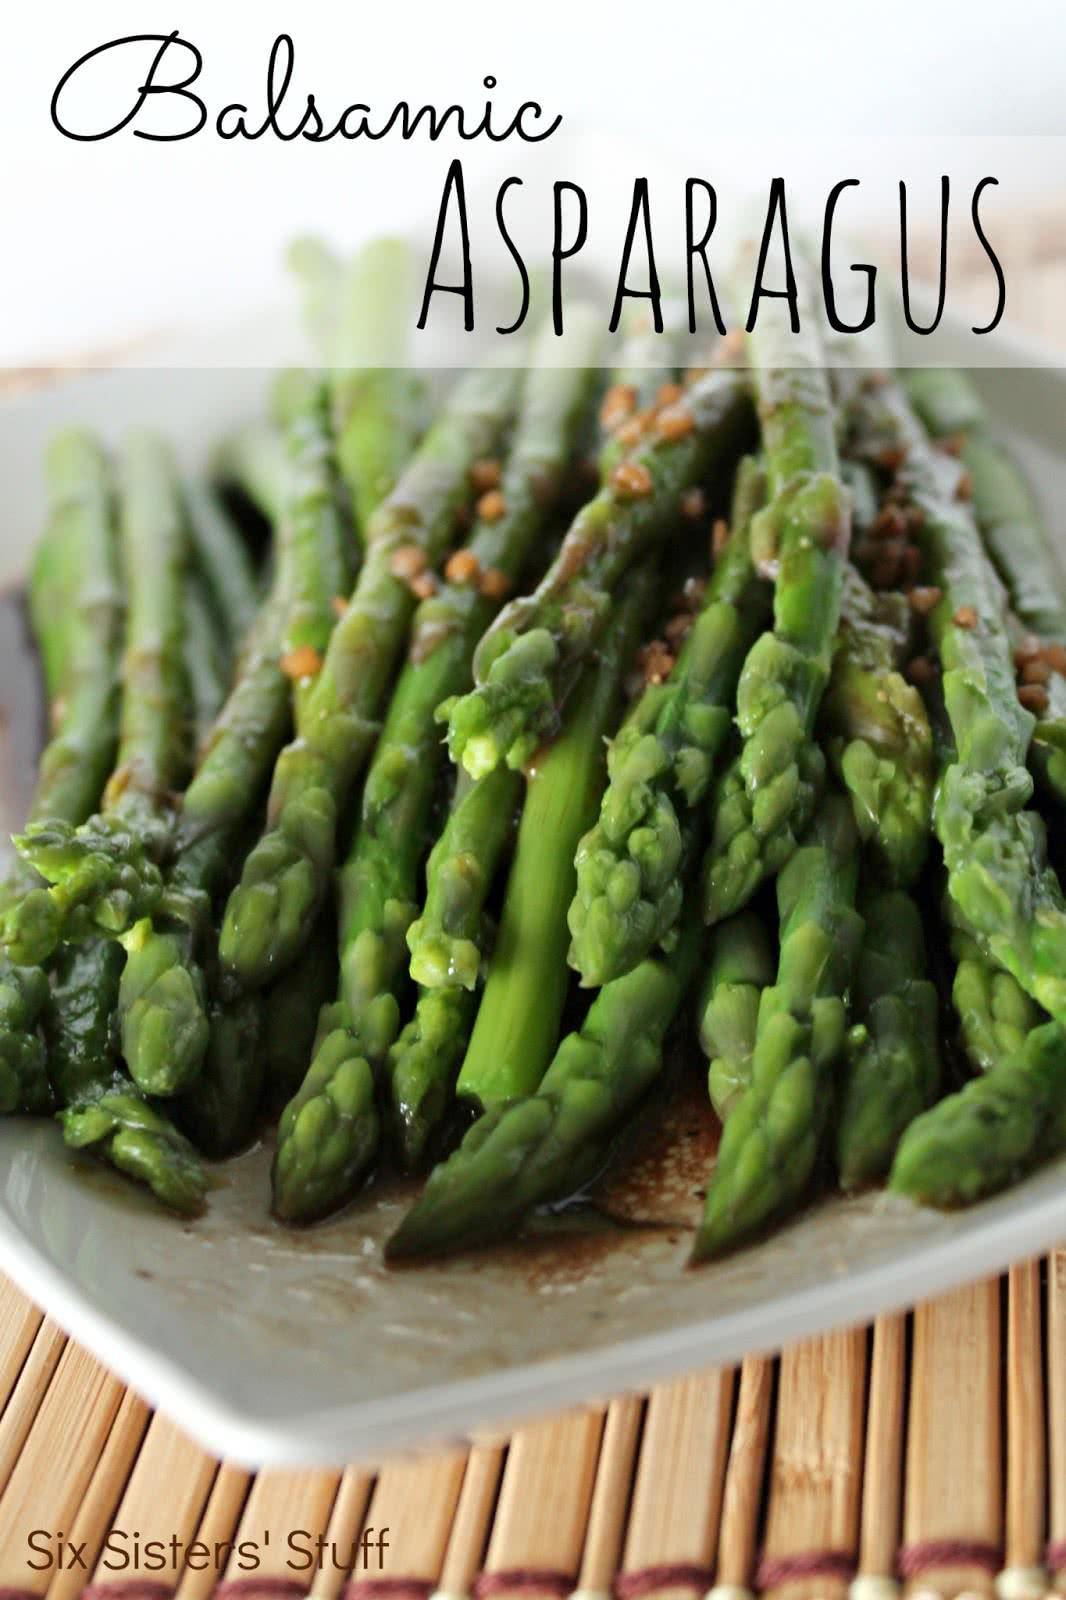 Balsamic+Asparagus[1]